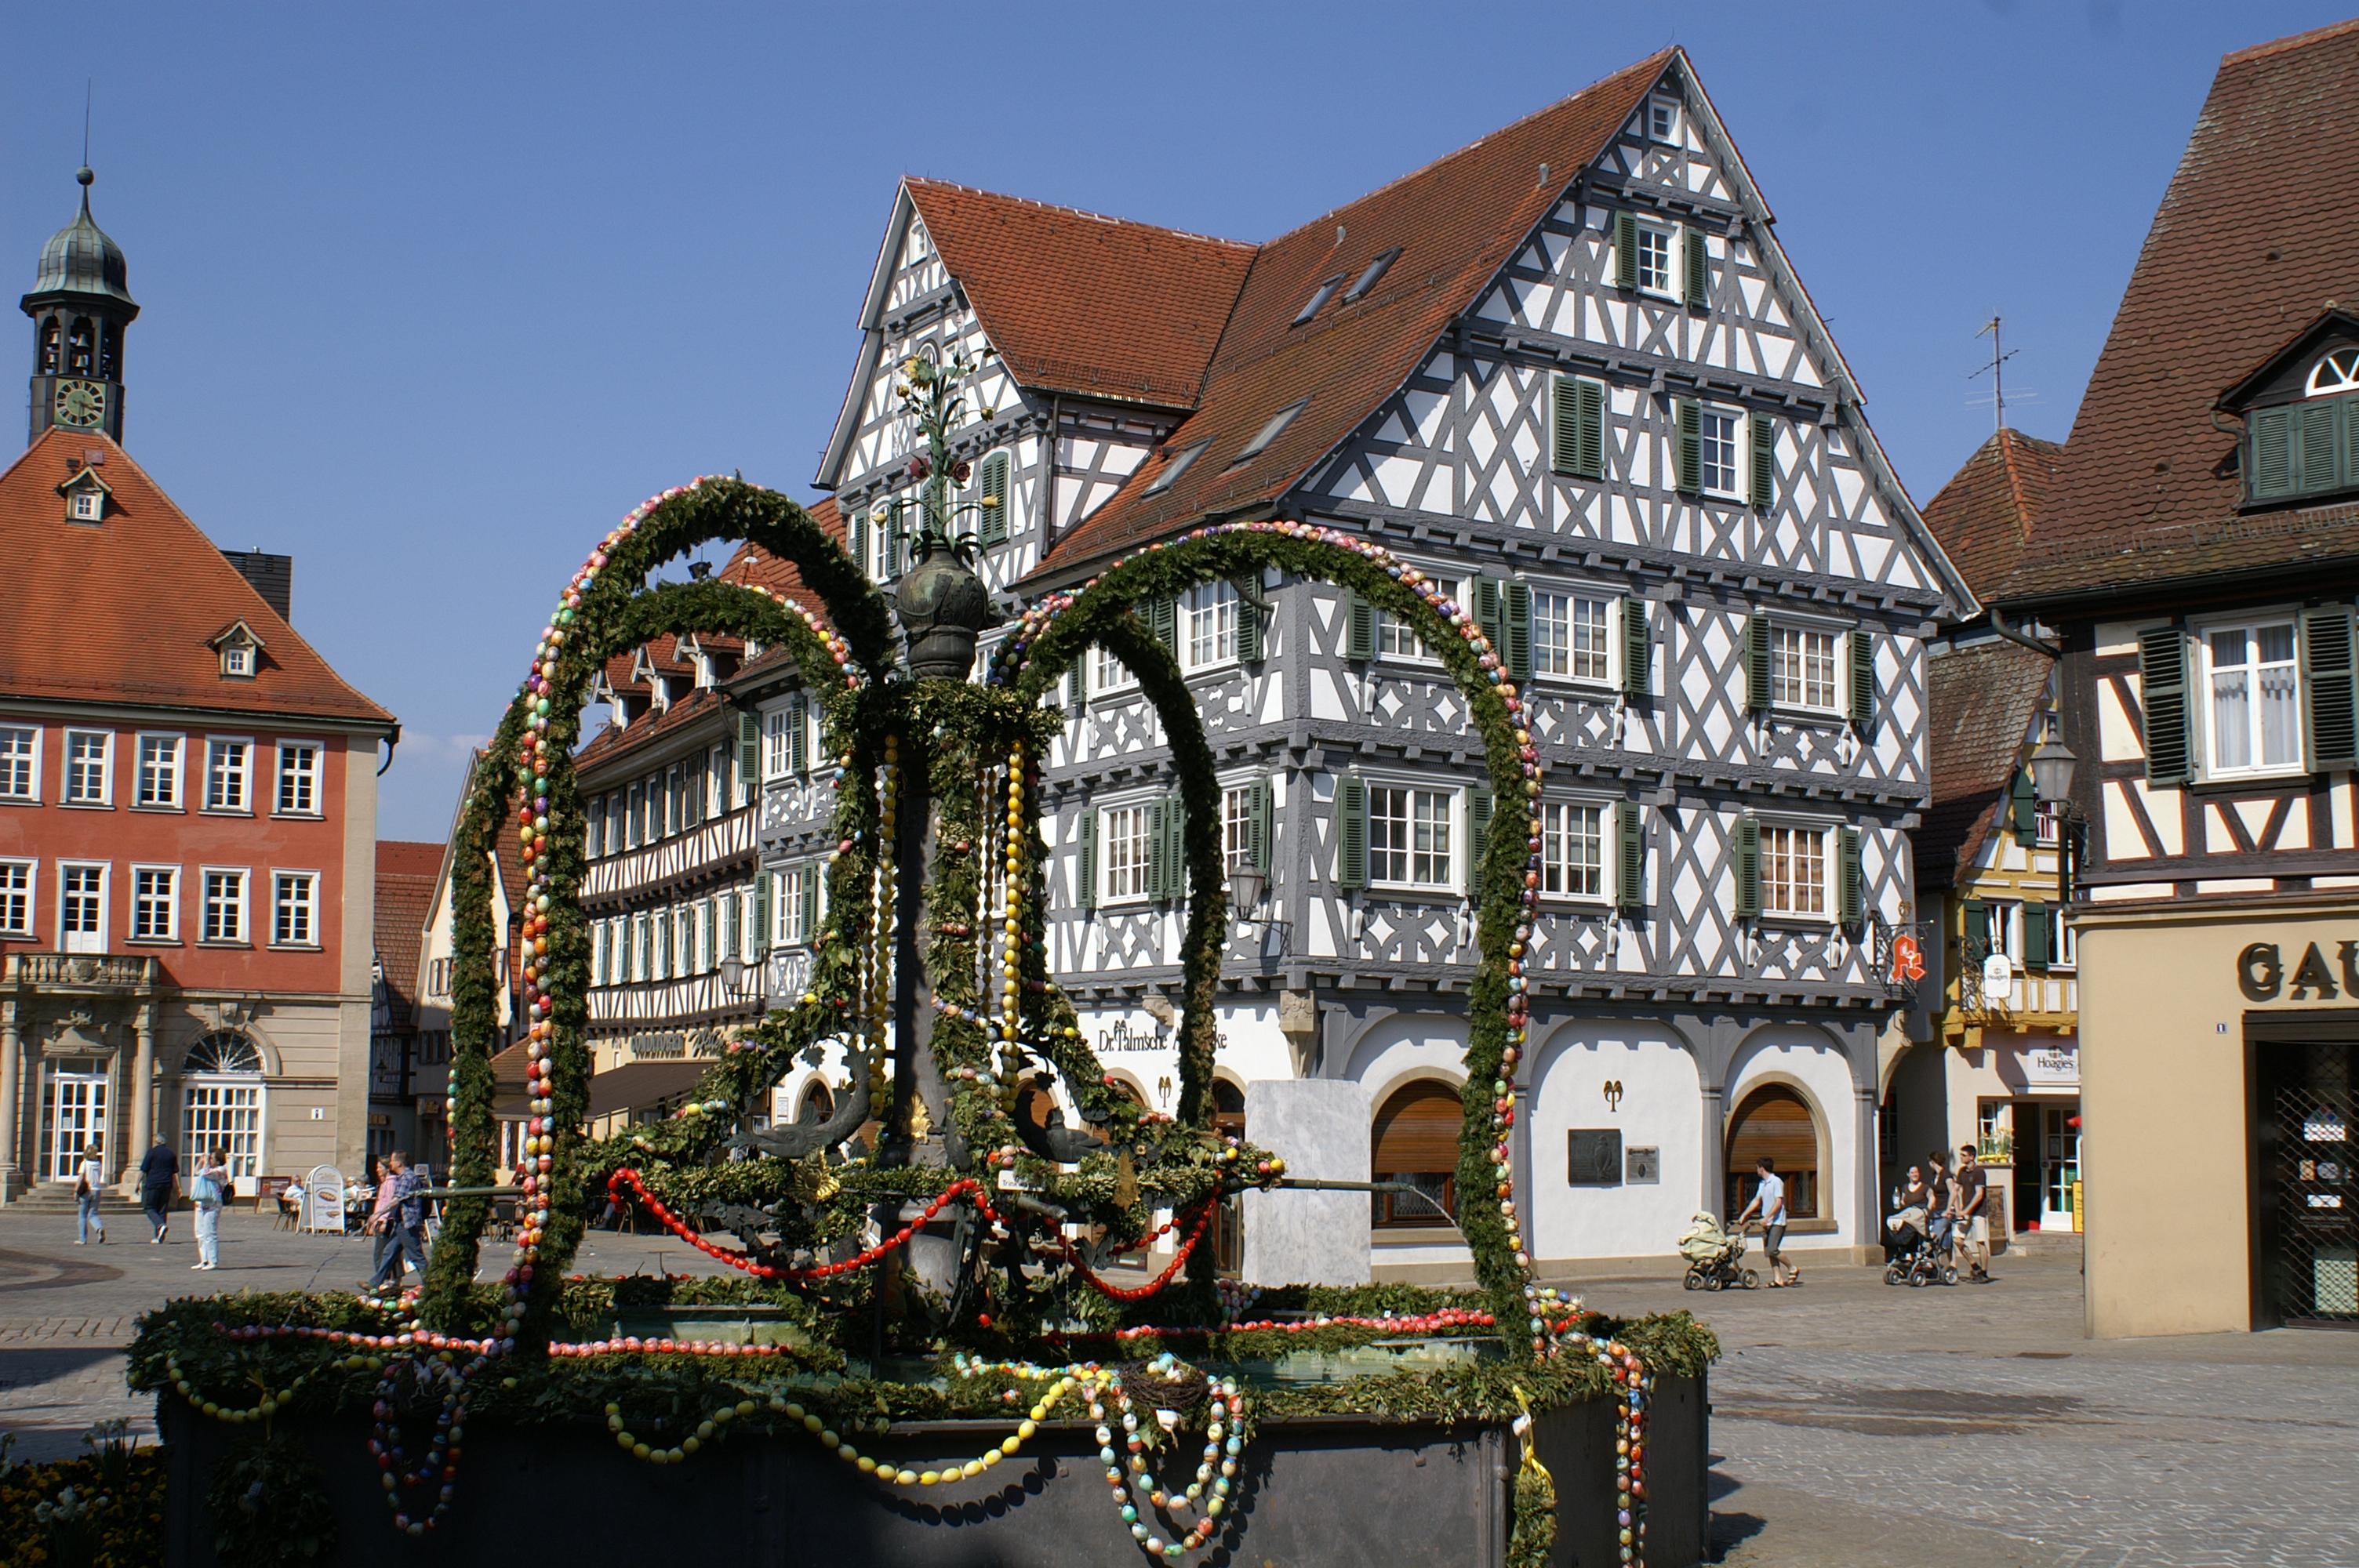 Single schorndorf